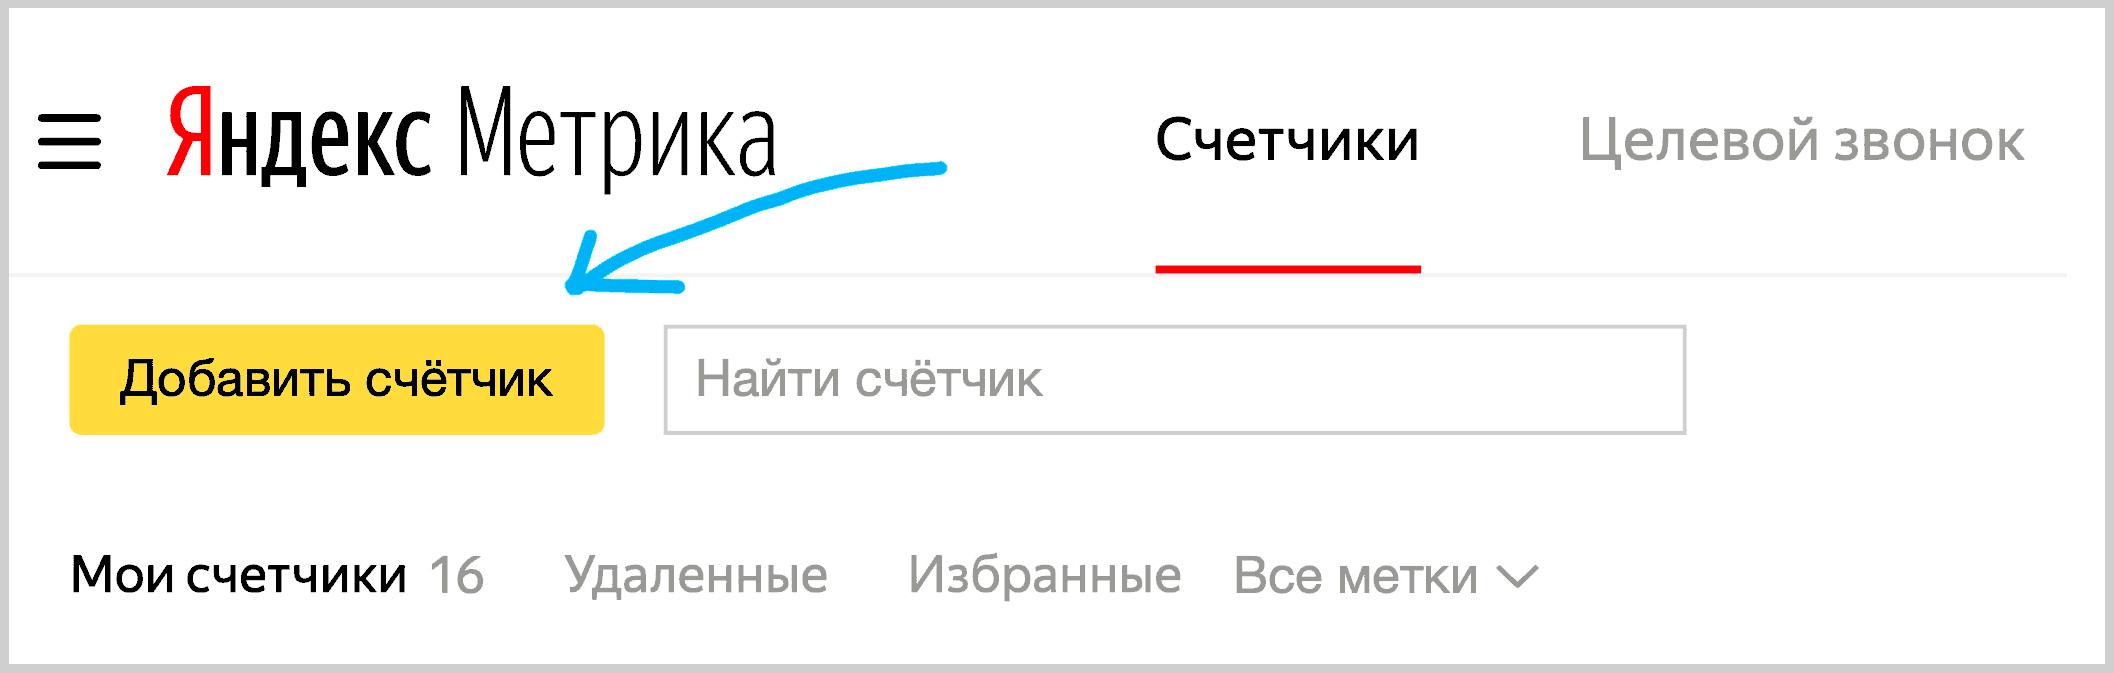 Аккаунт в Яндекс Метрики